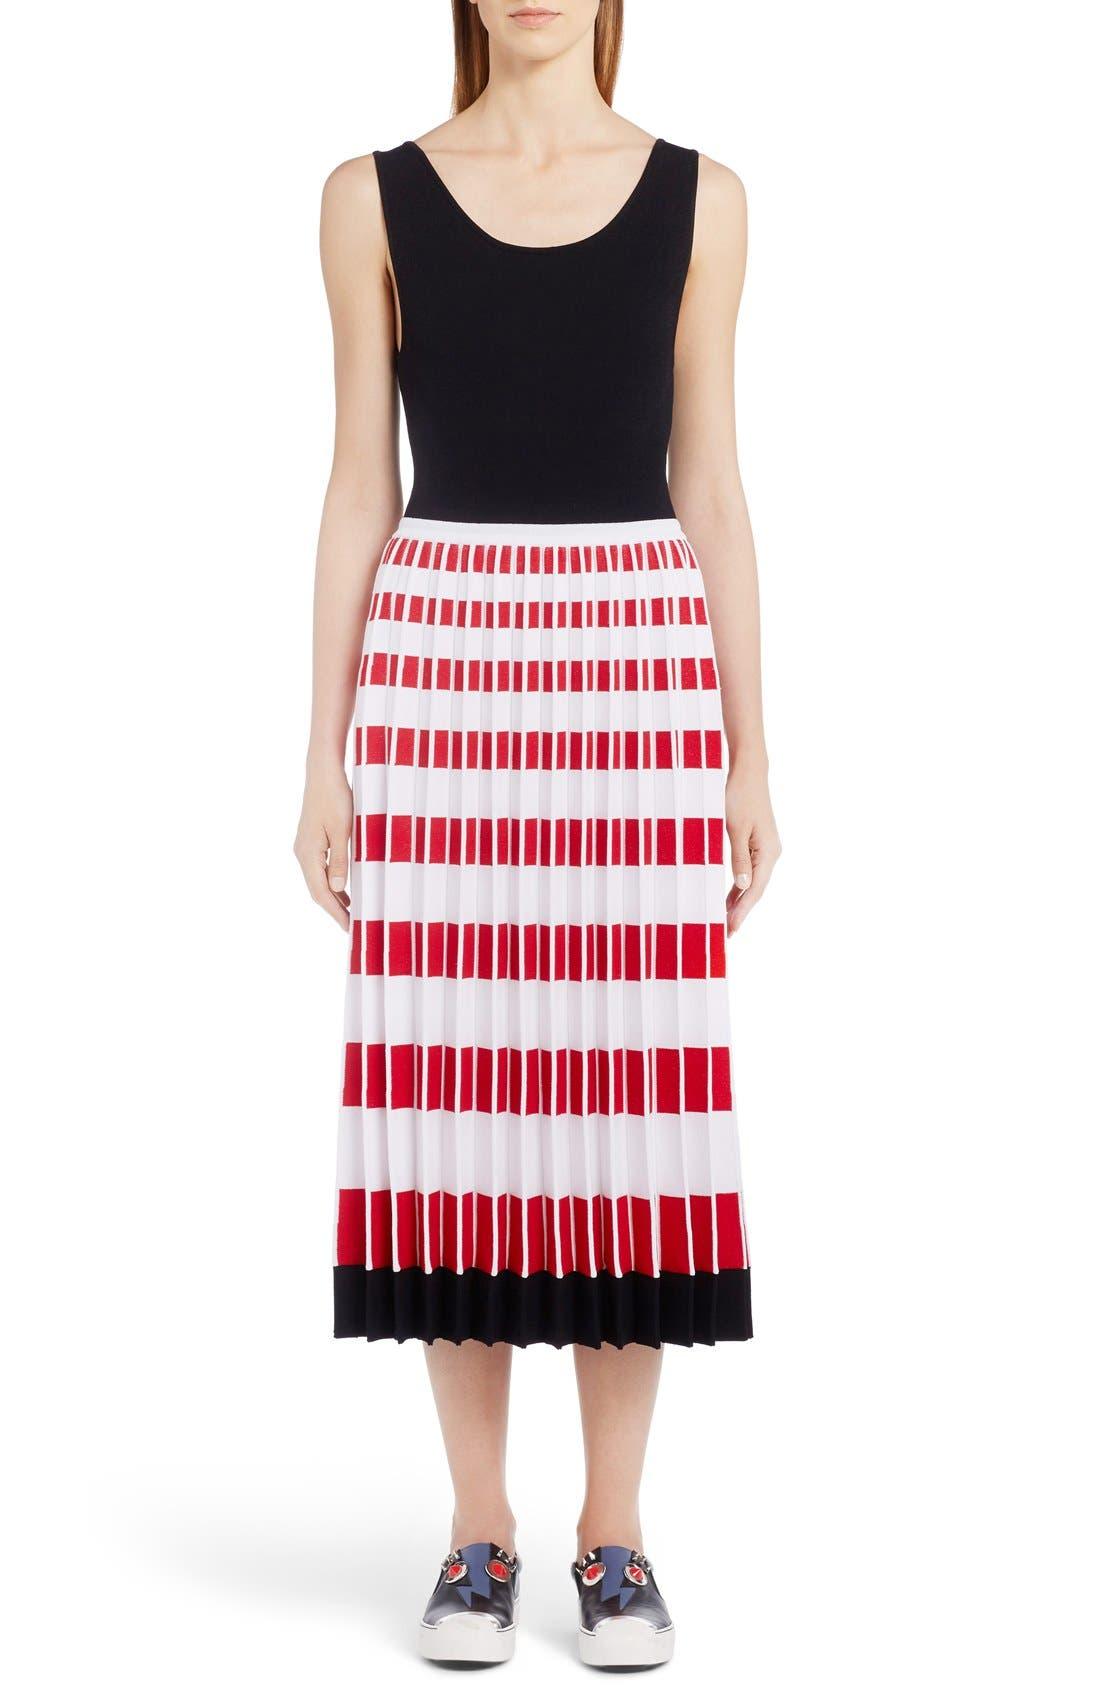 FENDI Kaleidoscope Print Knit Tank Dress